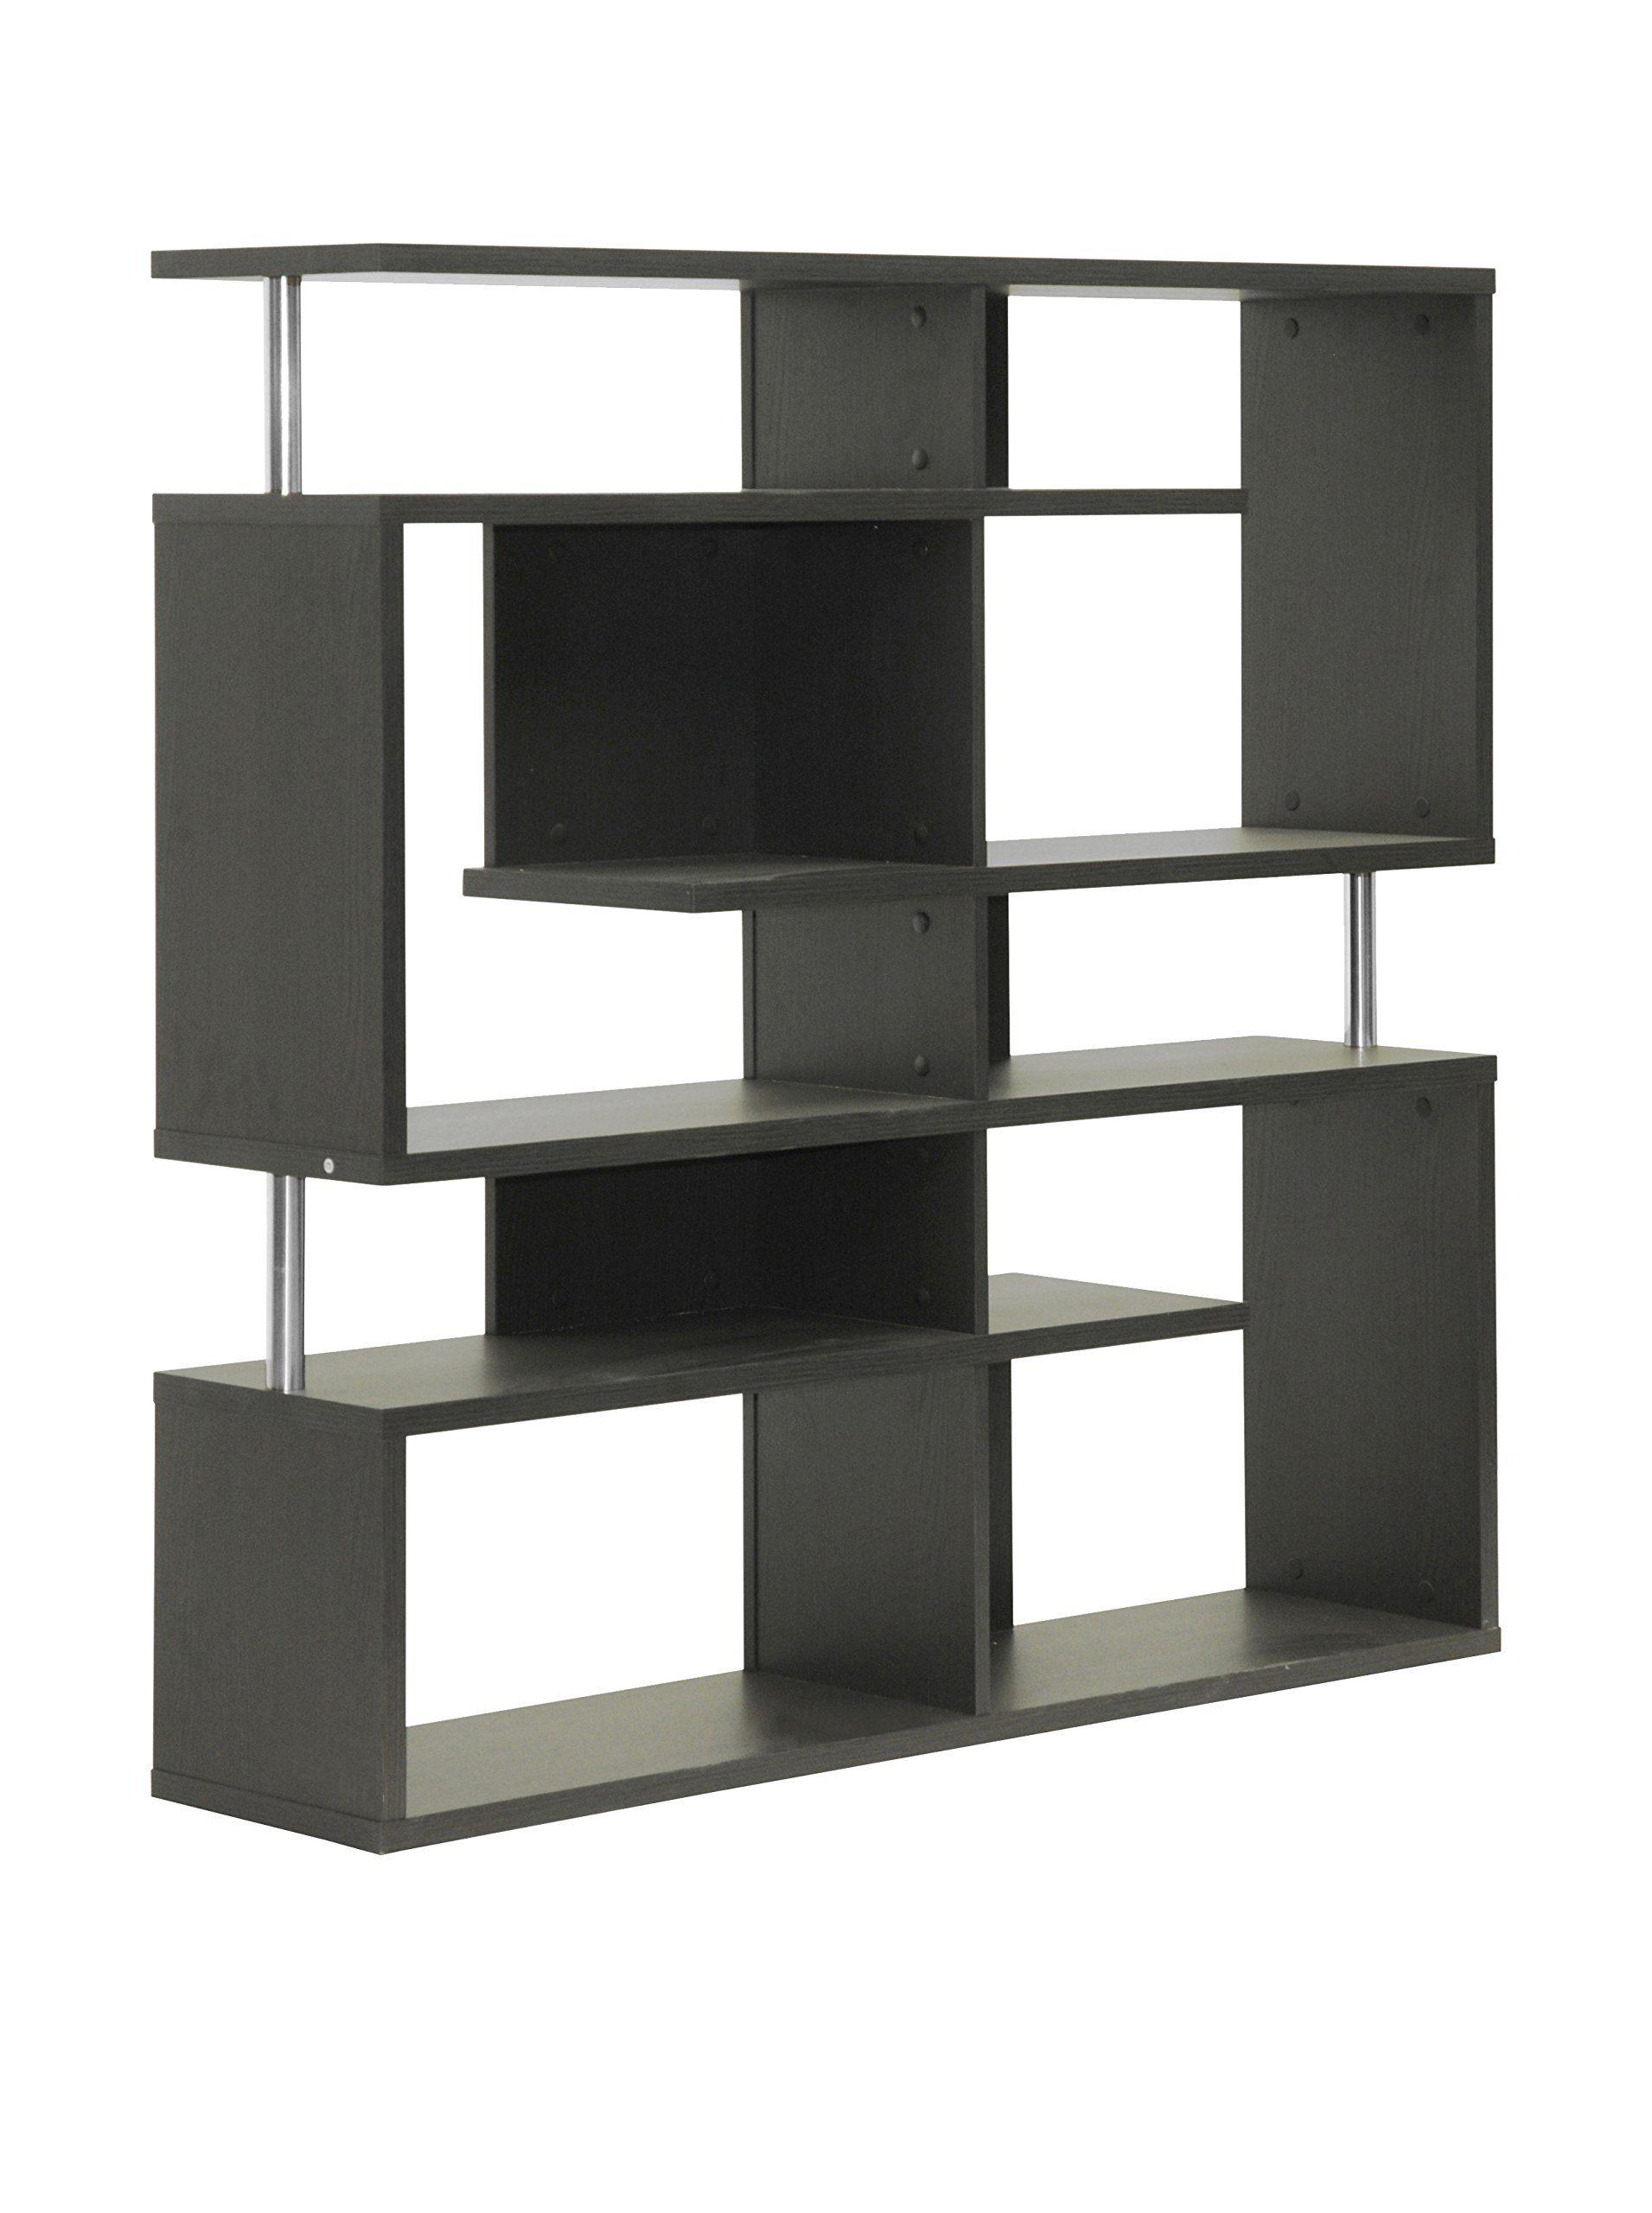 Baxton Studio Kessler Modern Bookshelf Medium Height Dark Brown